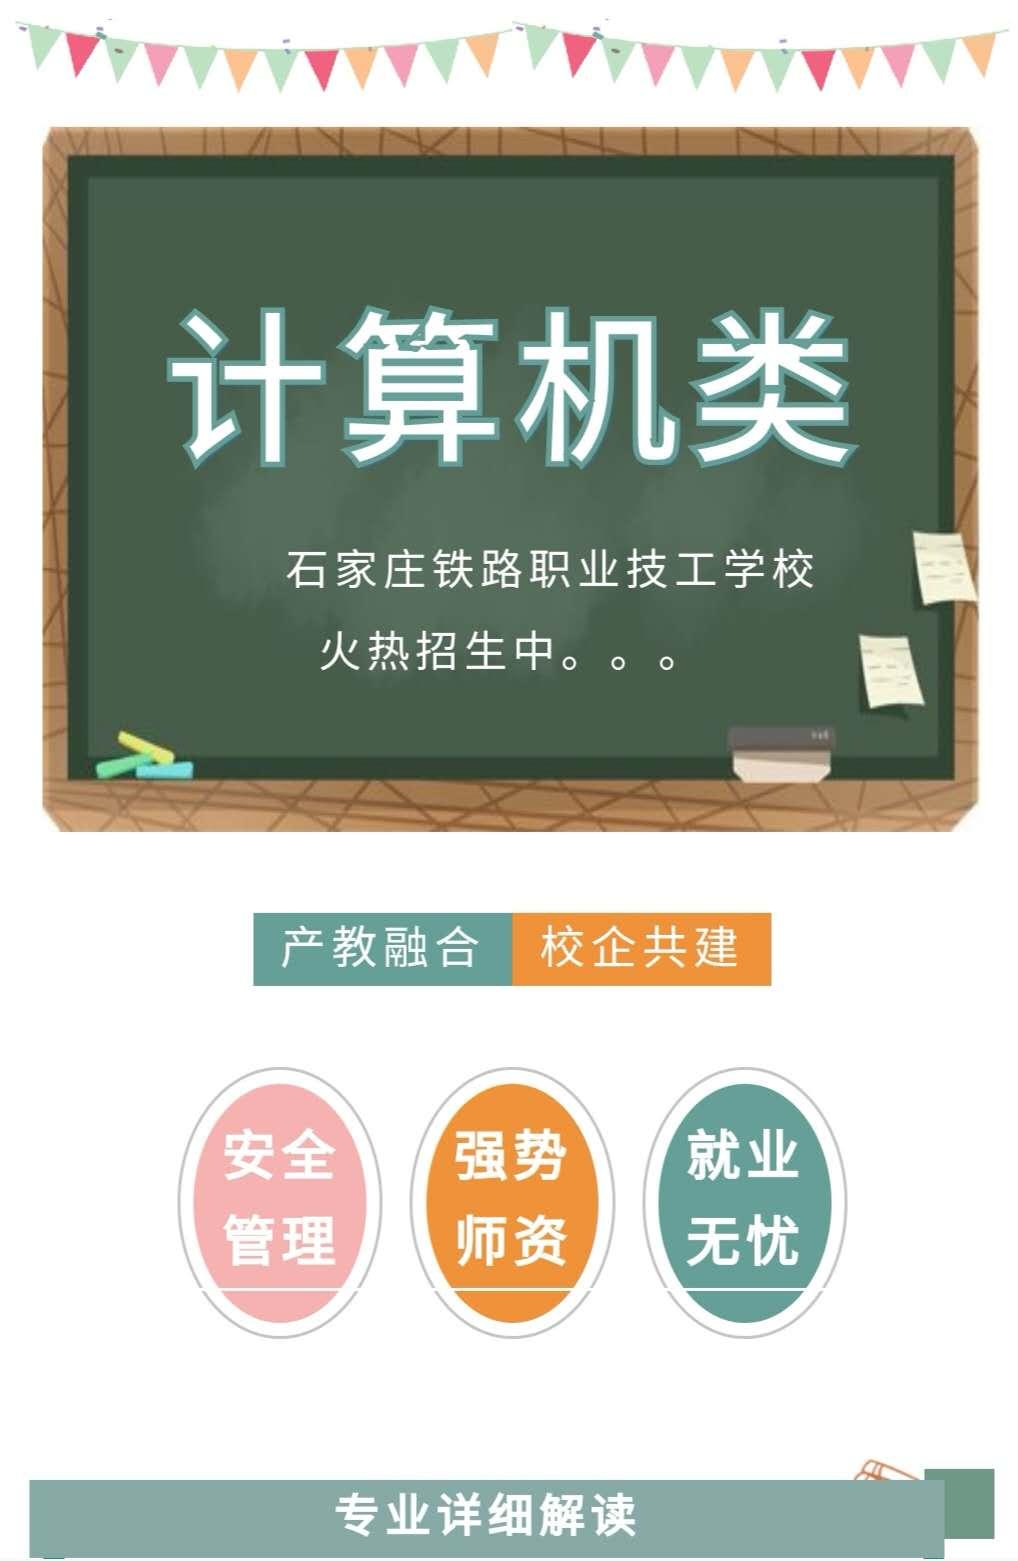 <a href='http://m.tljixiao.com' target='_blank'><u>石家庄<a href='http://m.tljixiao.com' target='_blank'><u>铁路学校</u></a></u></a>计算机相关专业